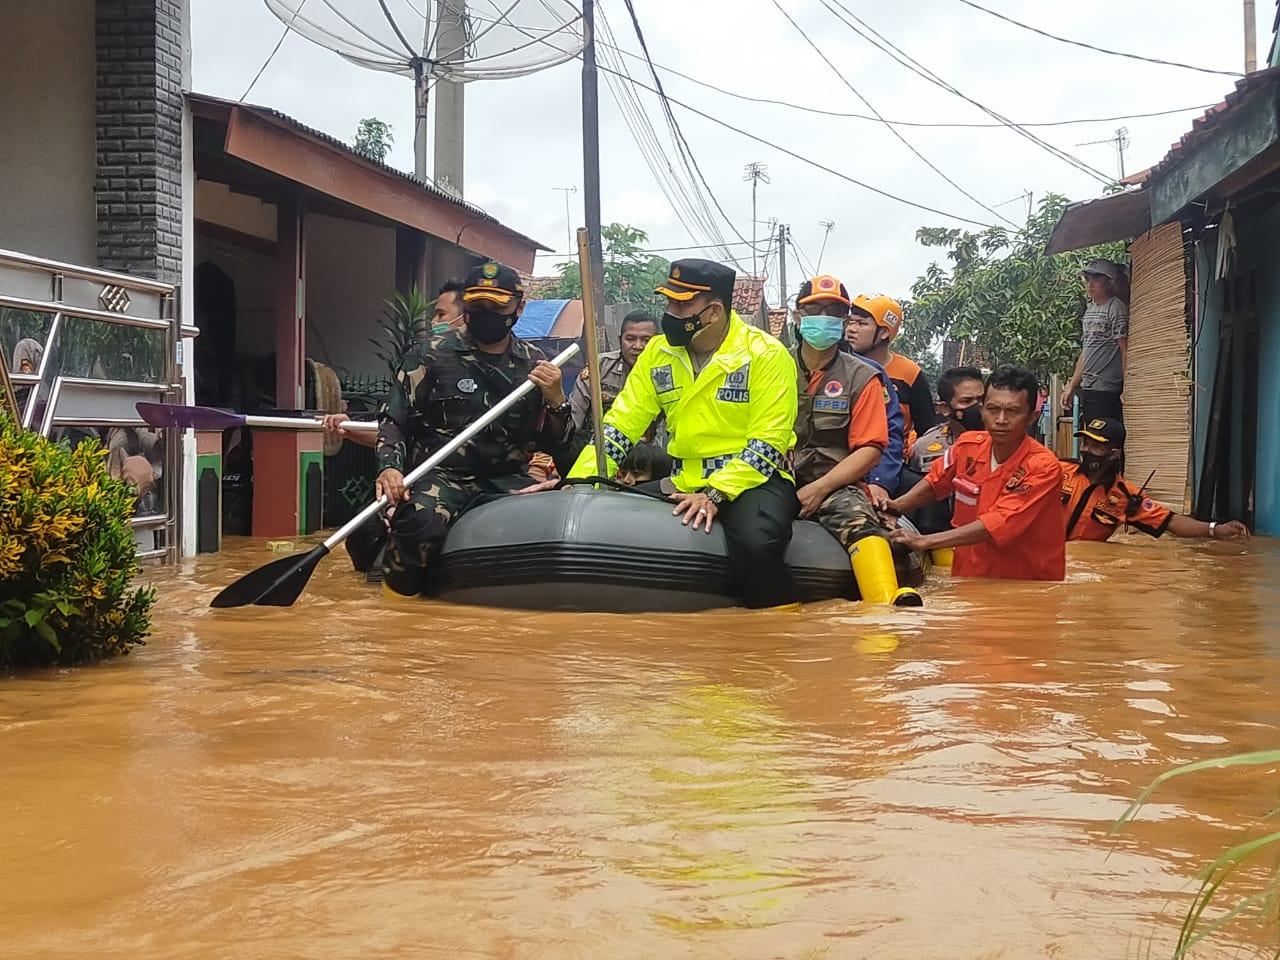 https: img.okezone.com content 2021 02 07 525 2358076 13-desa-dan-7-kecamatan-terendam-banjir-di-karawang-ribuan-warga-mengungsi-DWC0r345O2.jpg